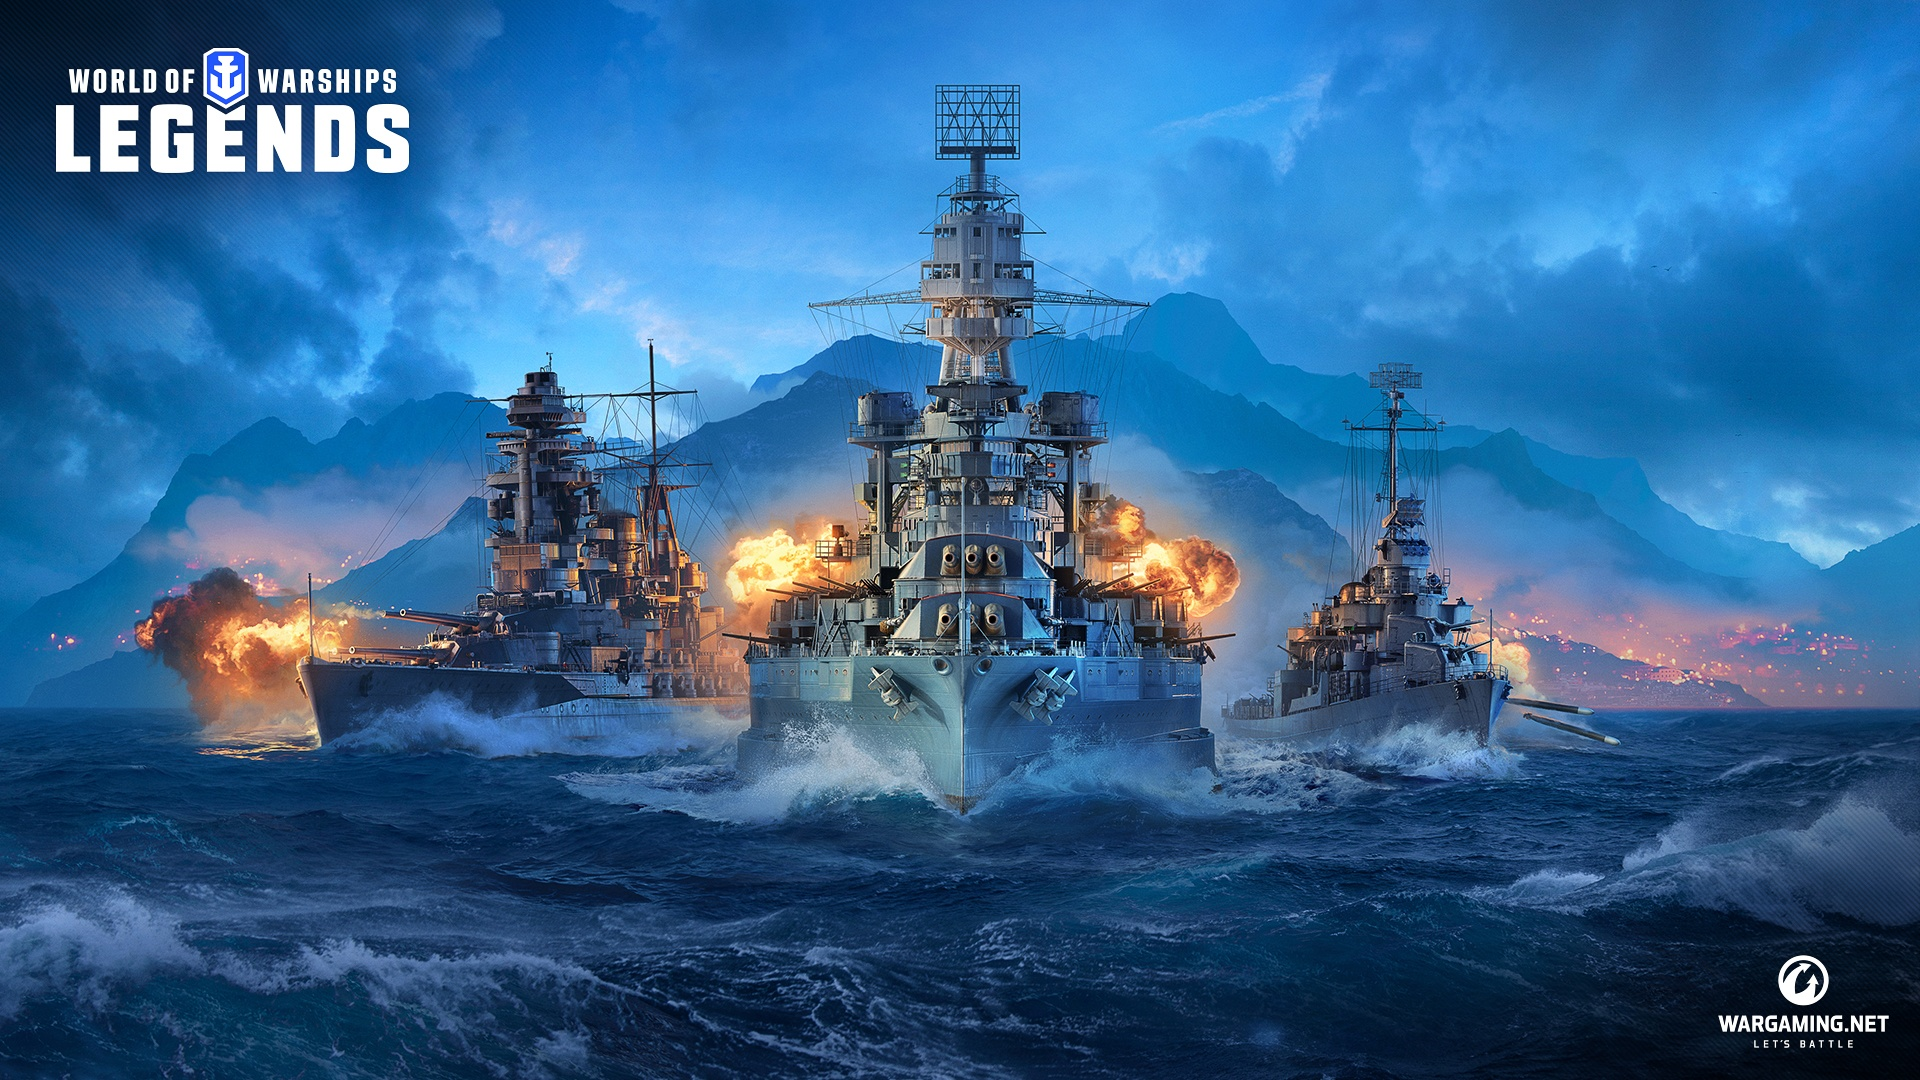 World of Warships: Legends kommt auf Xbox One & PS4 als neues Game